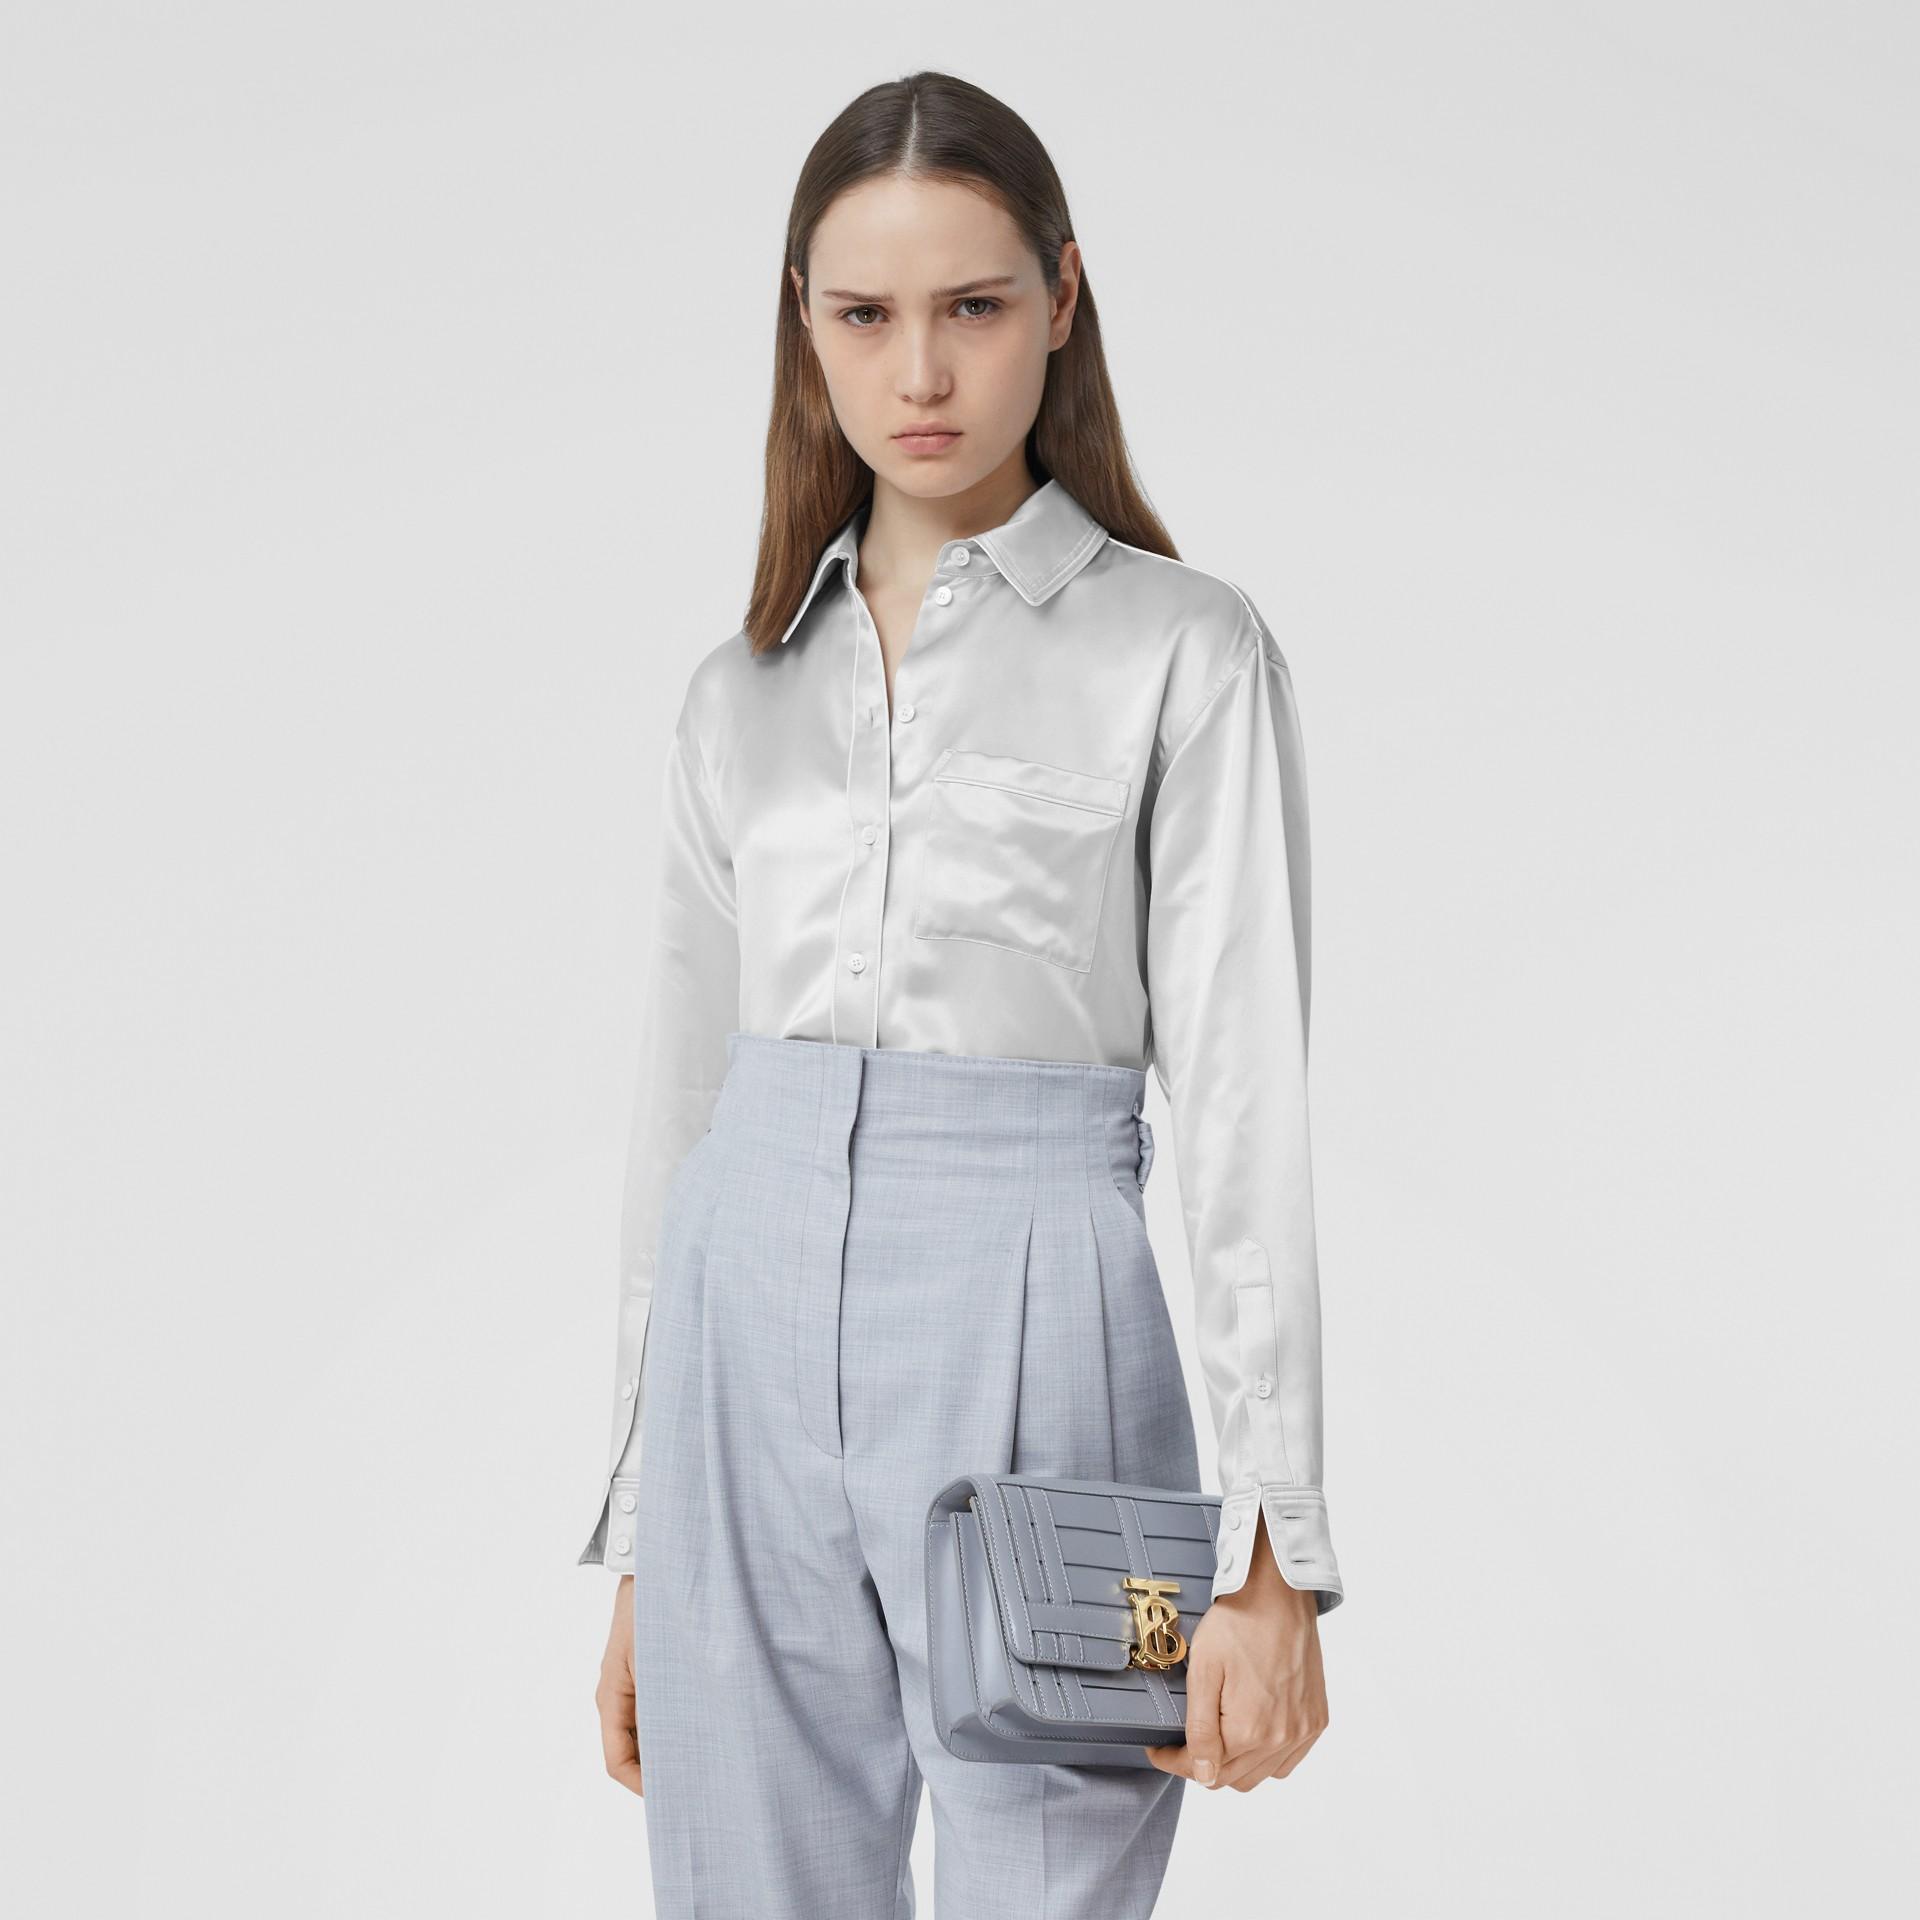 Silk Satin Shirt in Light Pebble Grey - Women | Burberry - gallery image 5